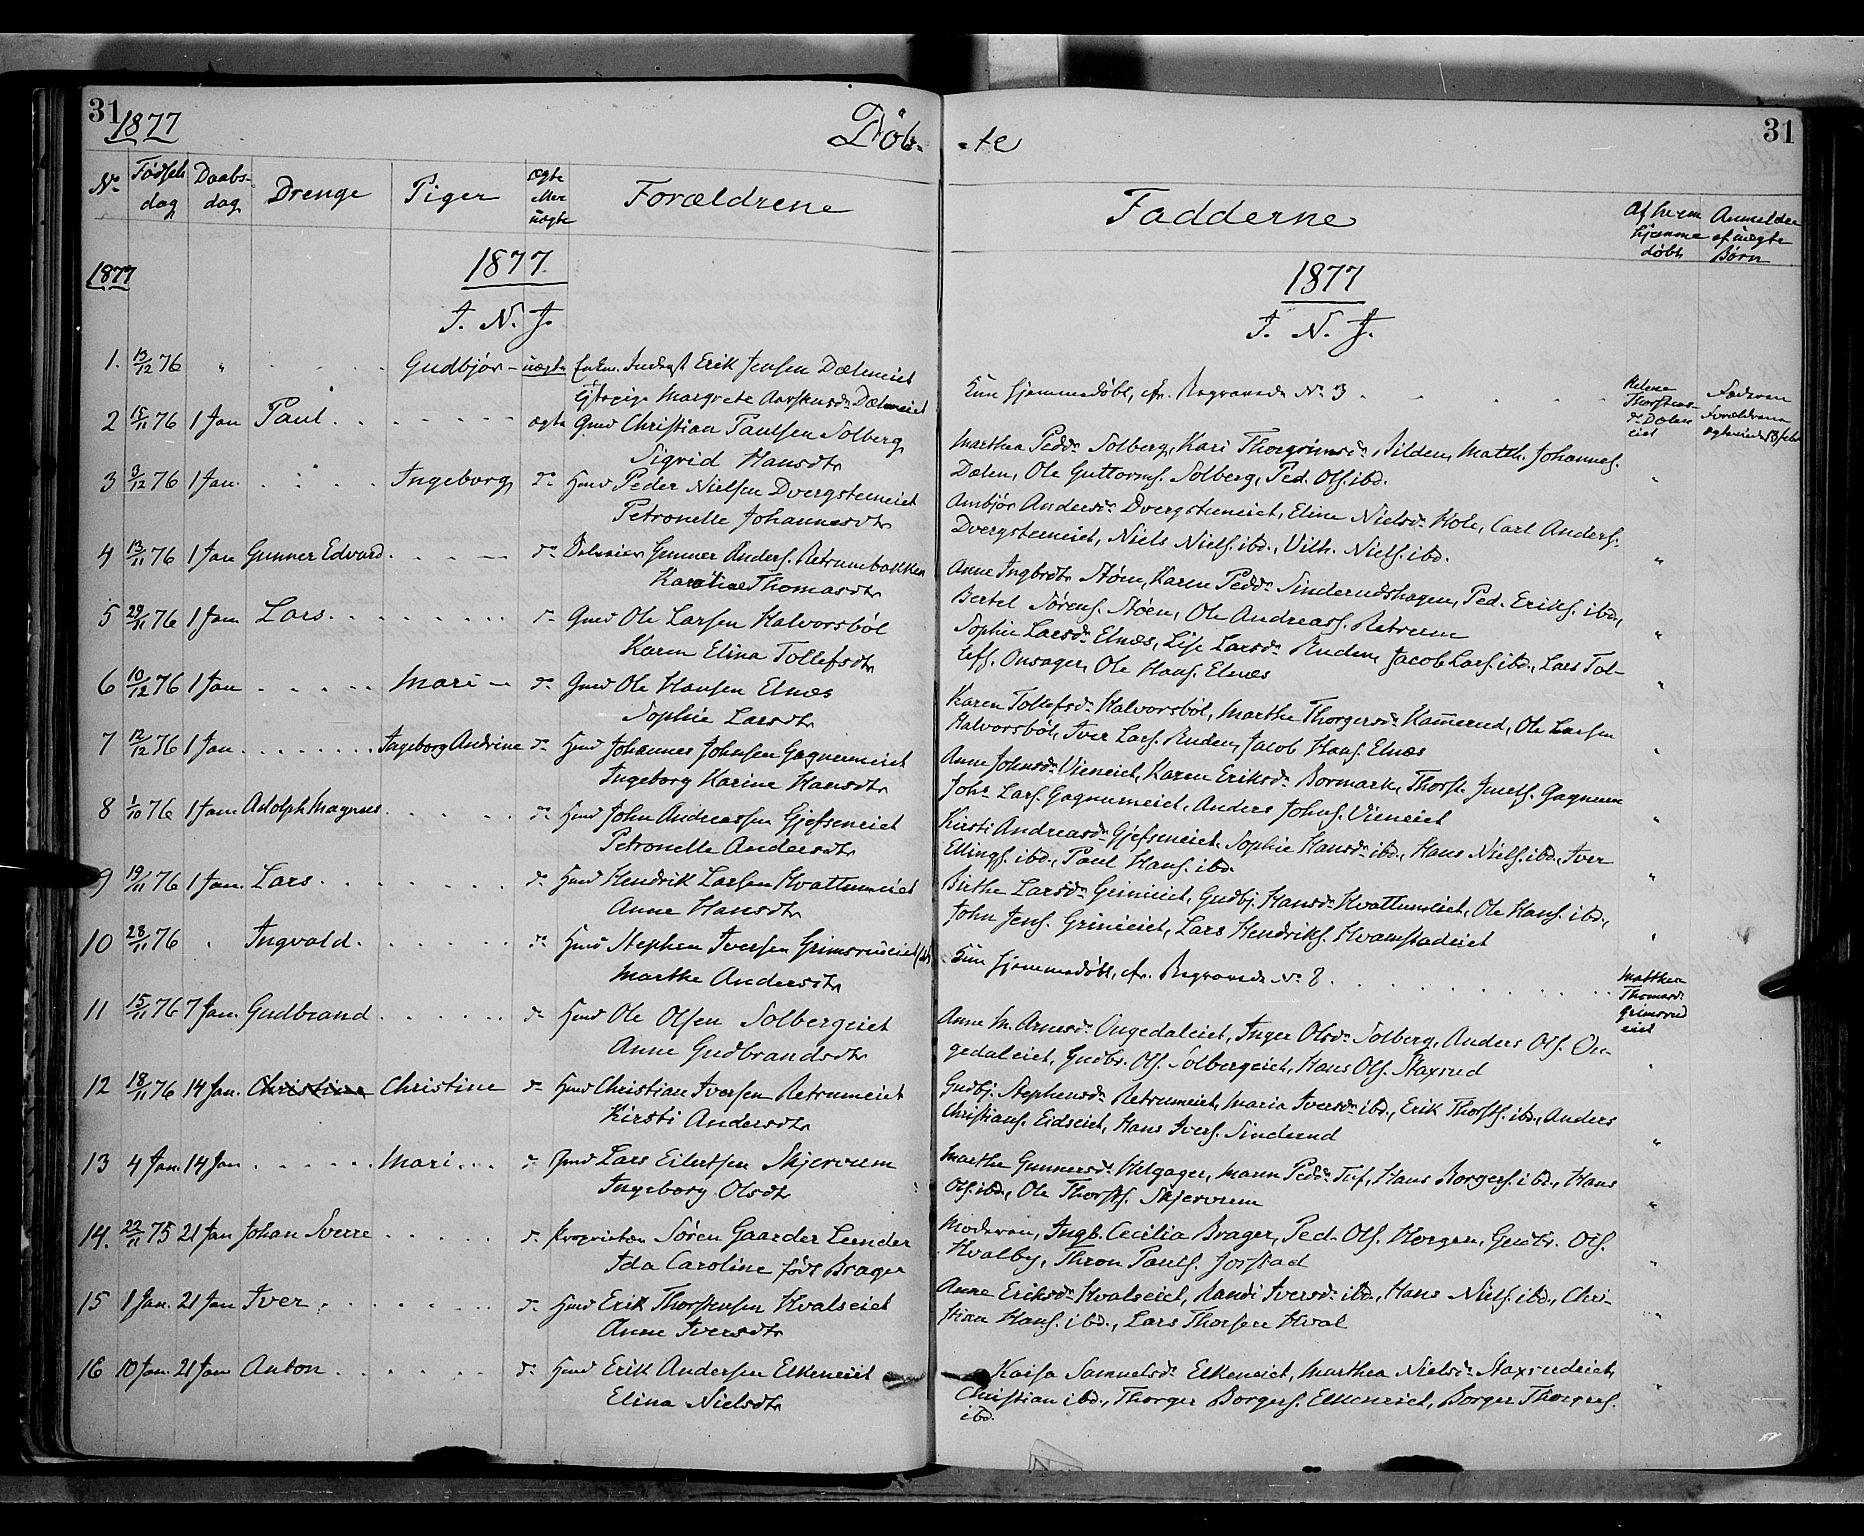 SAH, Gran prestekontor, Ministerialbok nr. 13, 1875-1879, s. 31